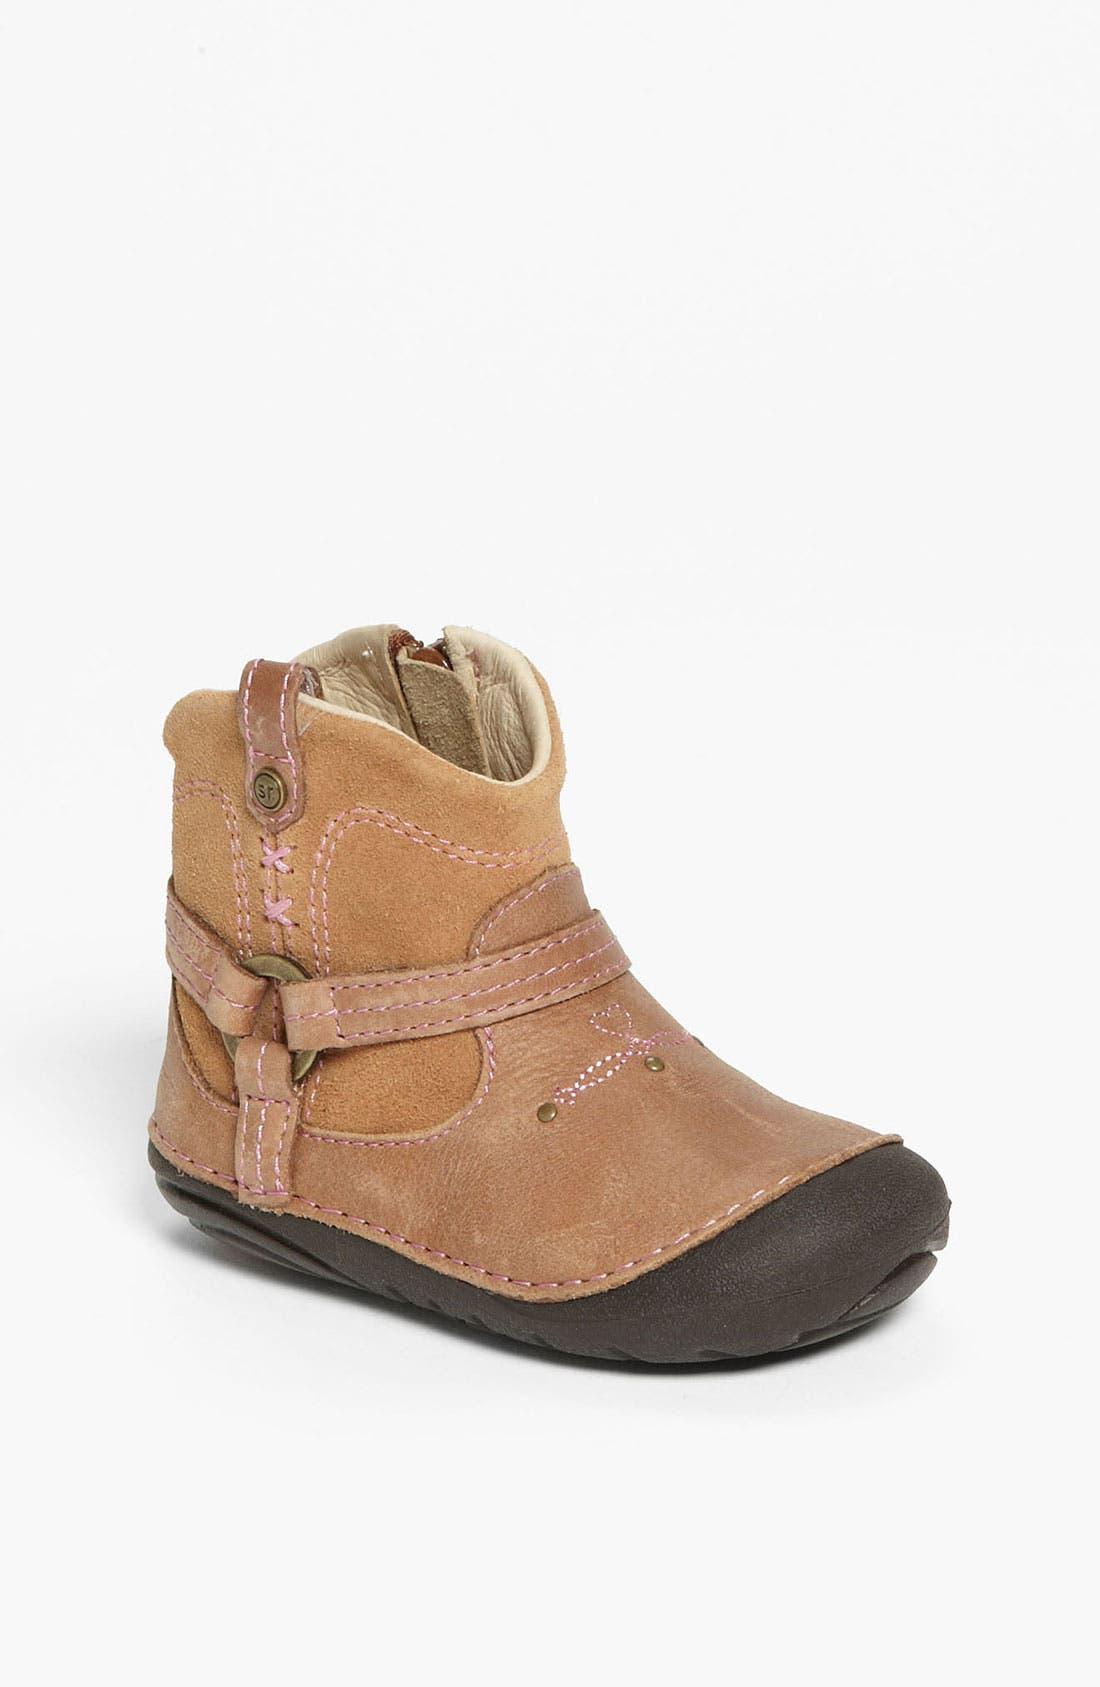 Alternate Image 1 Selected - Stride Rite 'Heather' Boot (Baby & Walker)